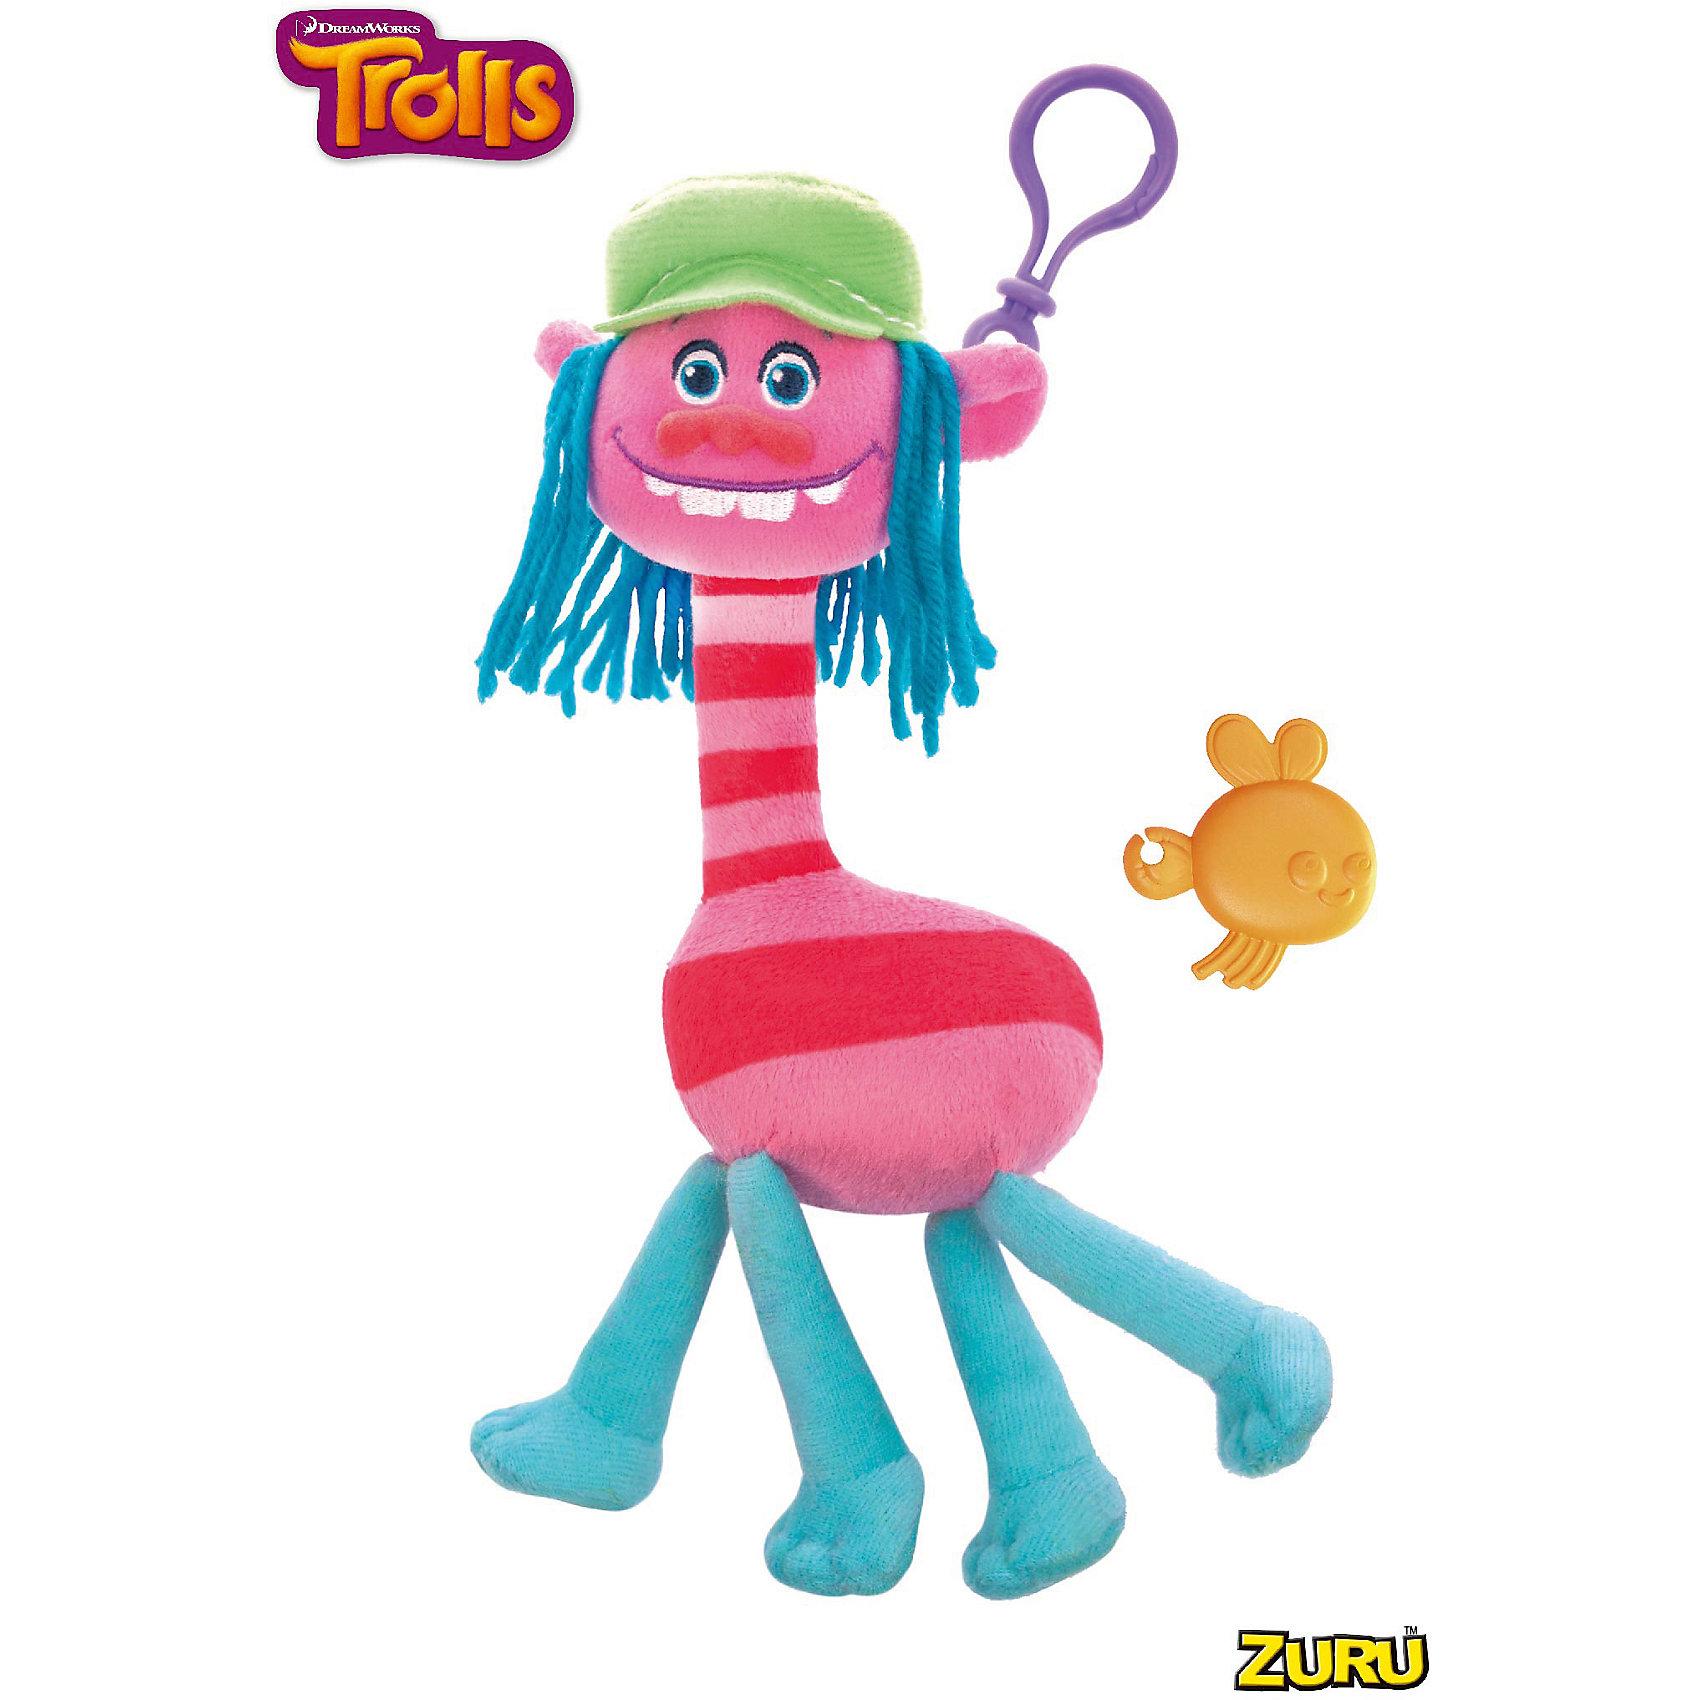 ZURU Тролль-кукла Купер, 26 см кукла пинки купер в москве картинки